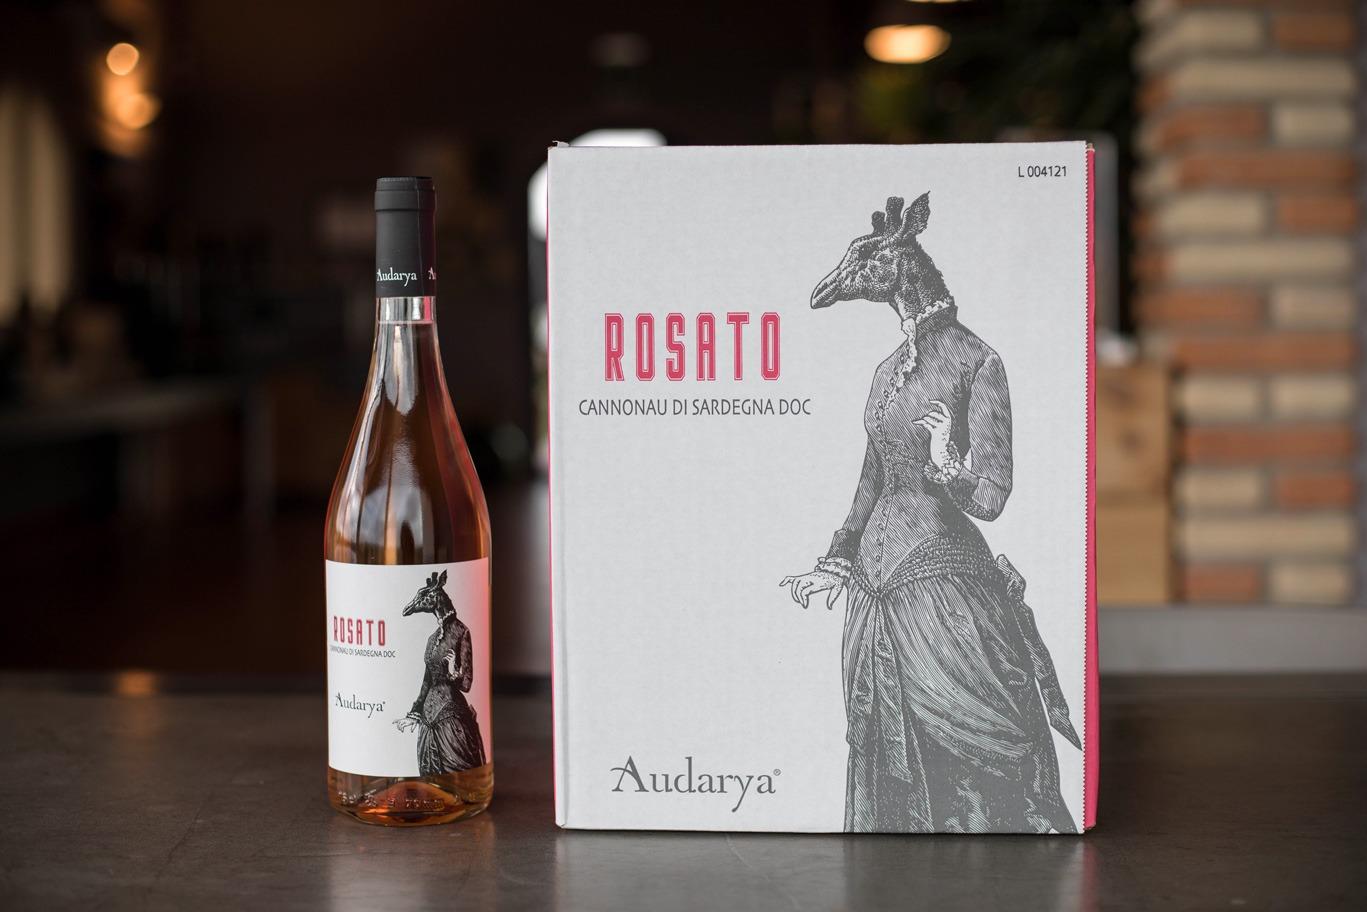 rosato cannonau di Sardegna doc Audarya scatola da sei